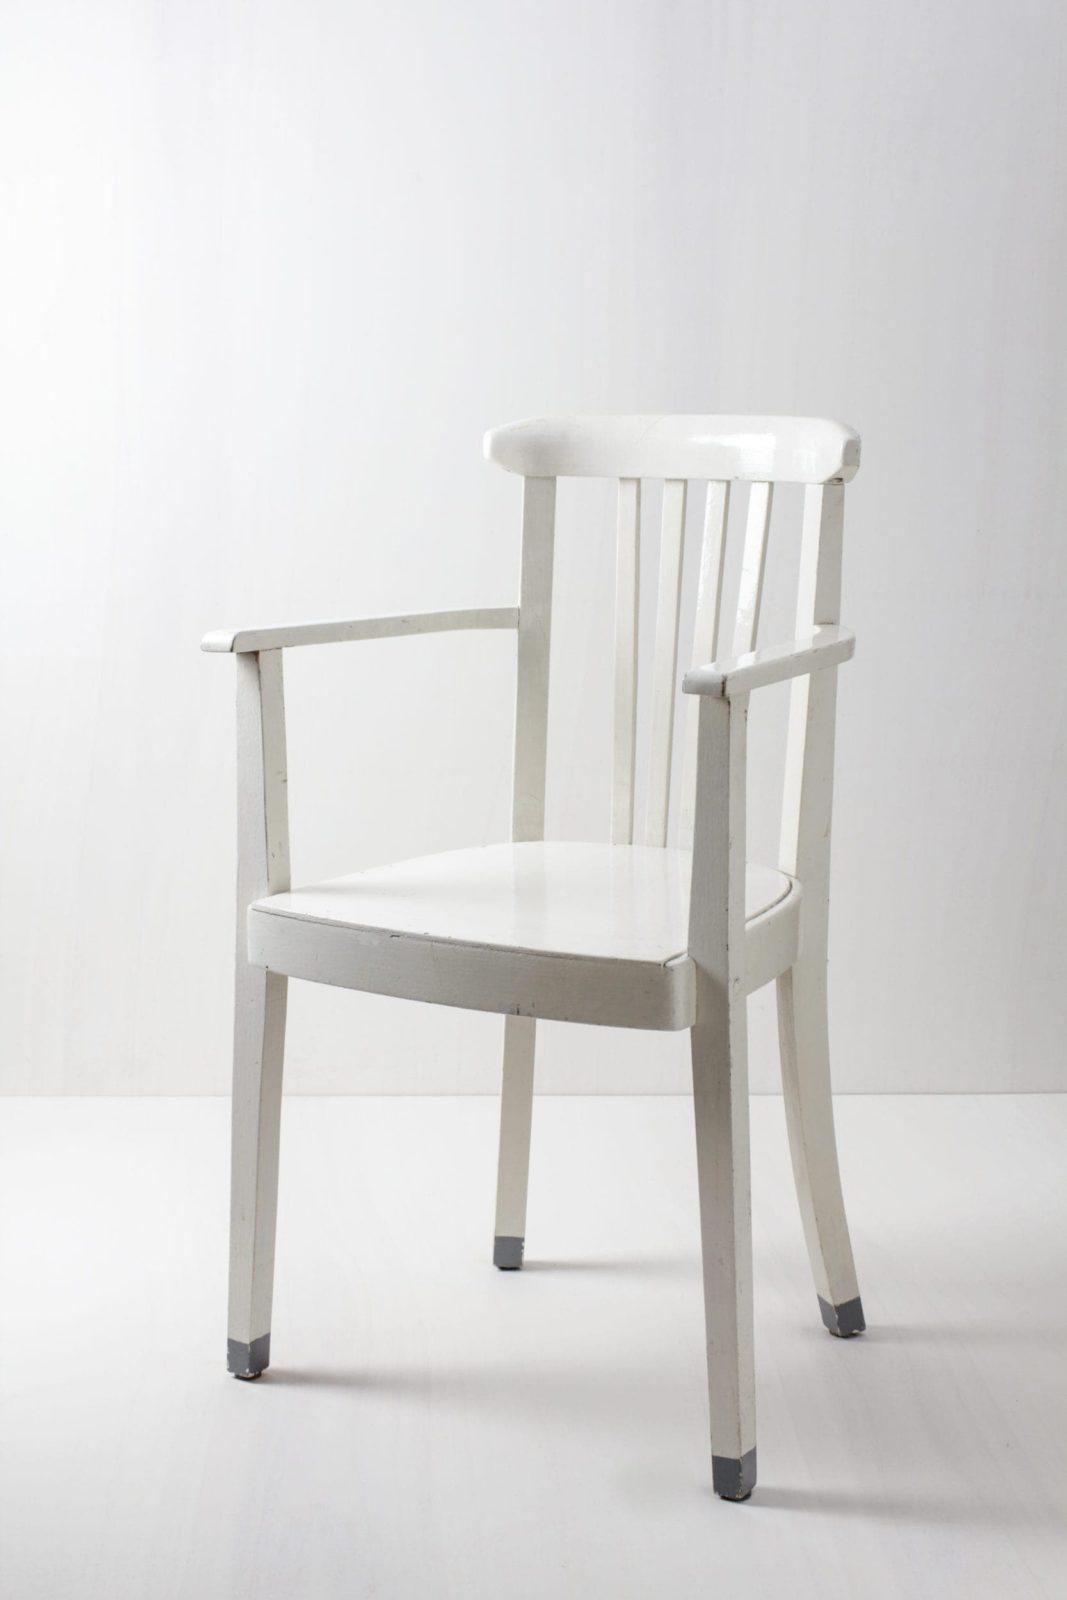 Armchair Josefa   Dining chair with nice patina and a high backrest. Frankfurt chair, Viennese avant-garde style.   gotvintage Rental & Event Design